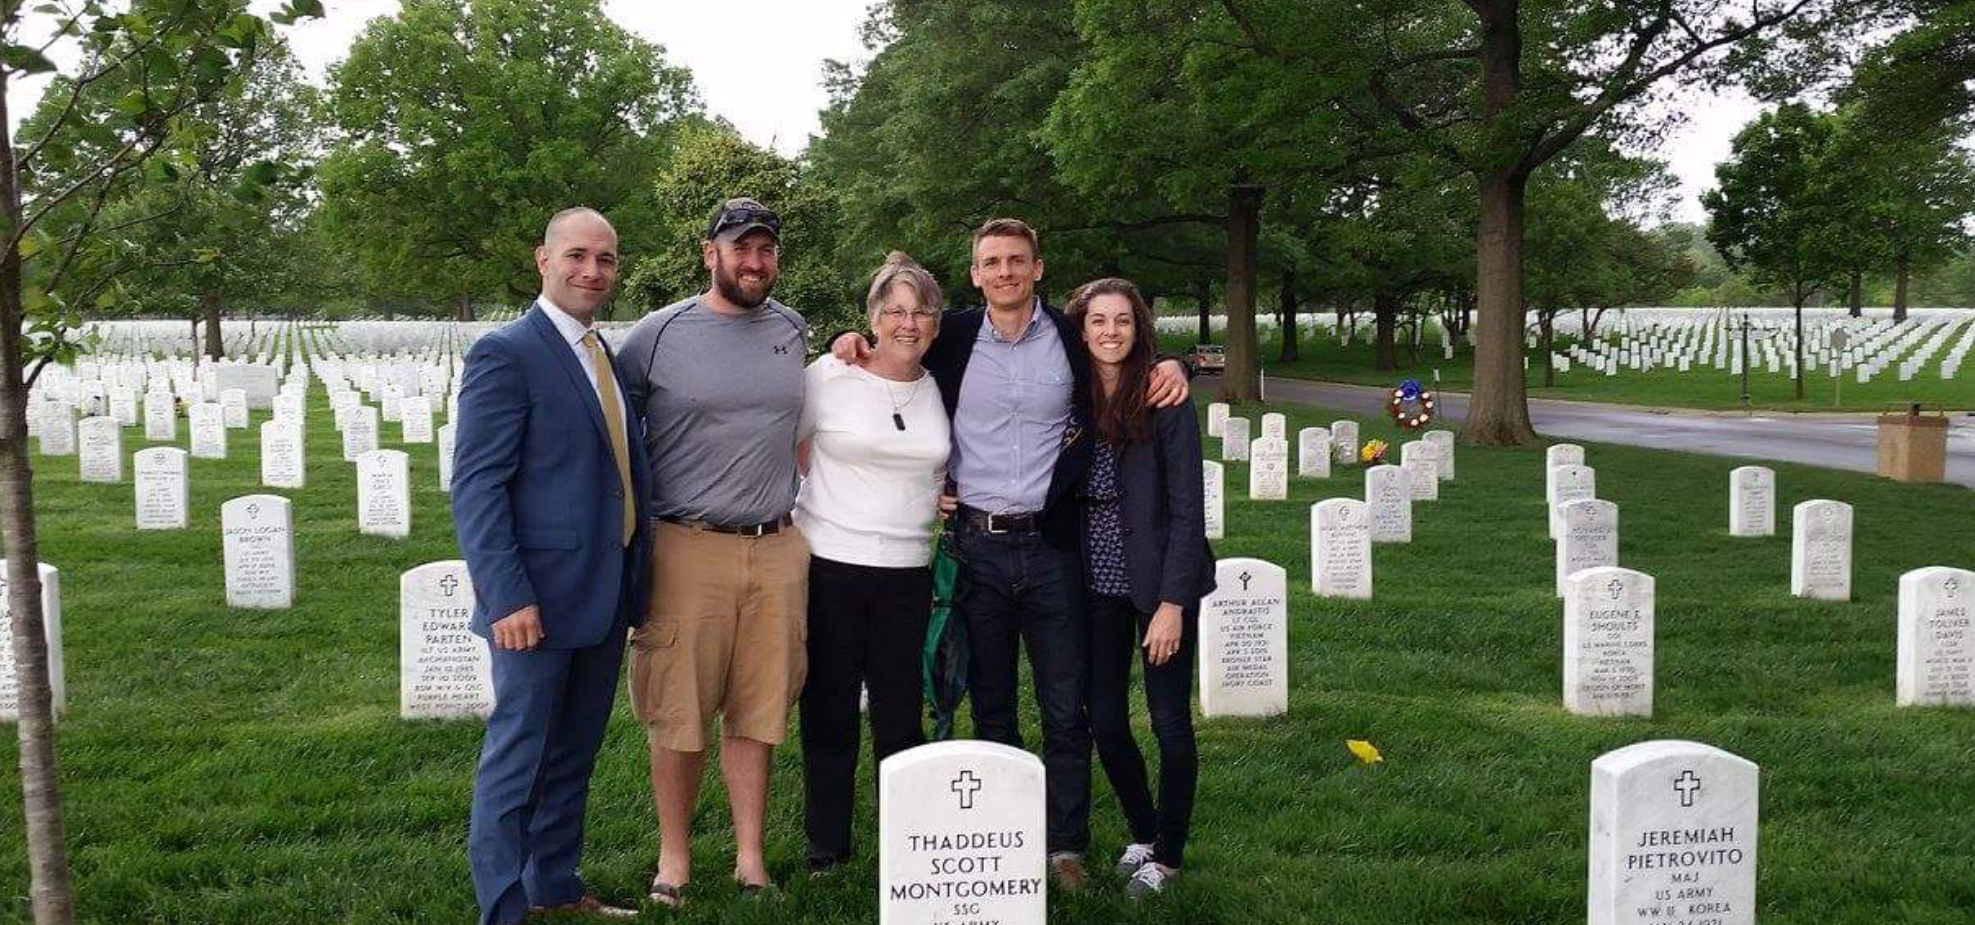 Objective Zero Envisions a World With Zero Veteran Suicides